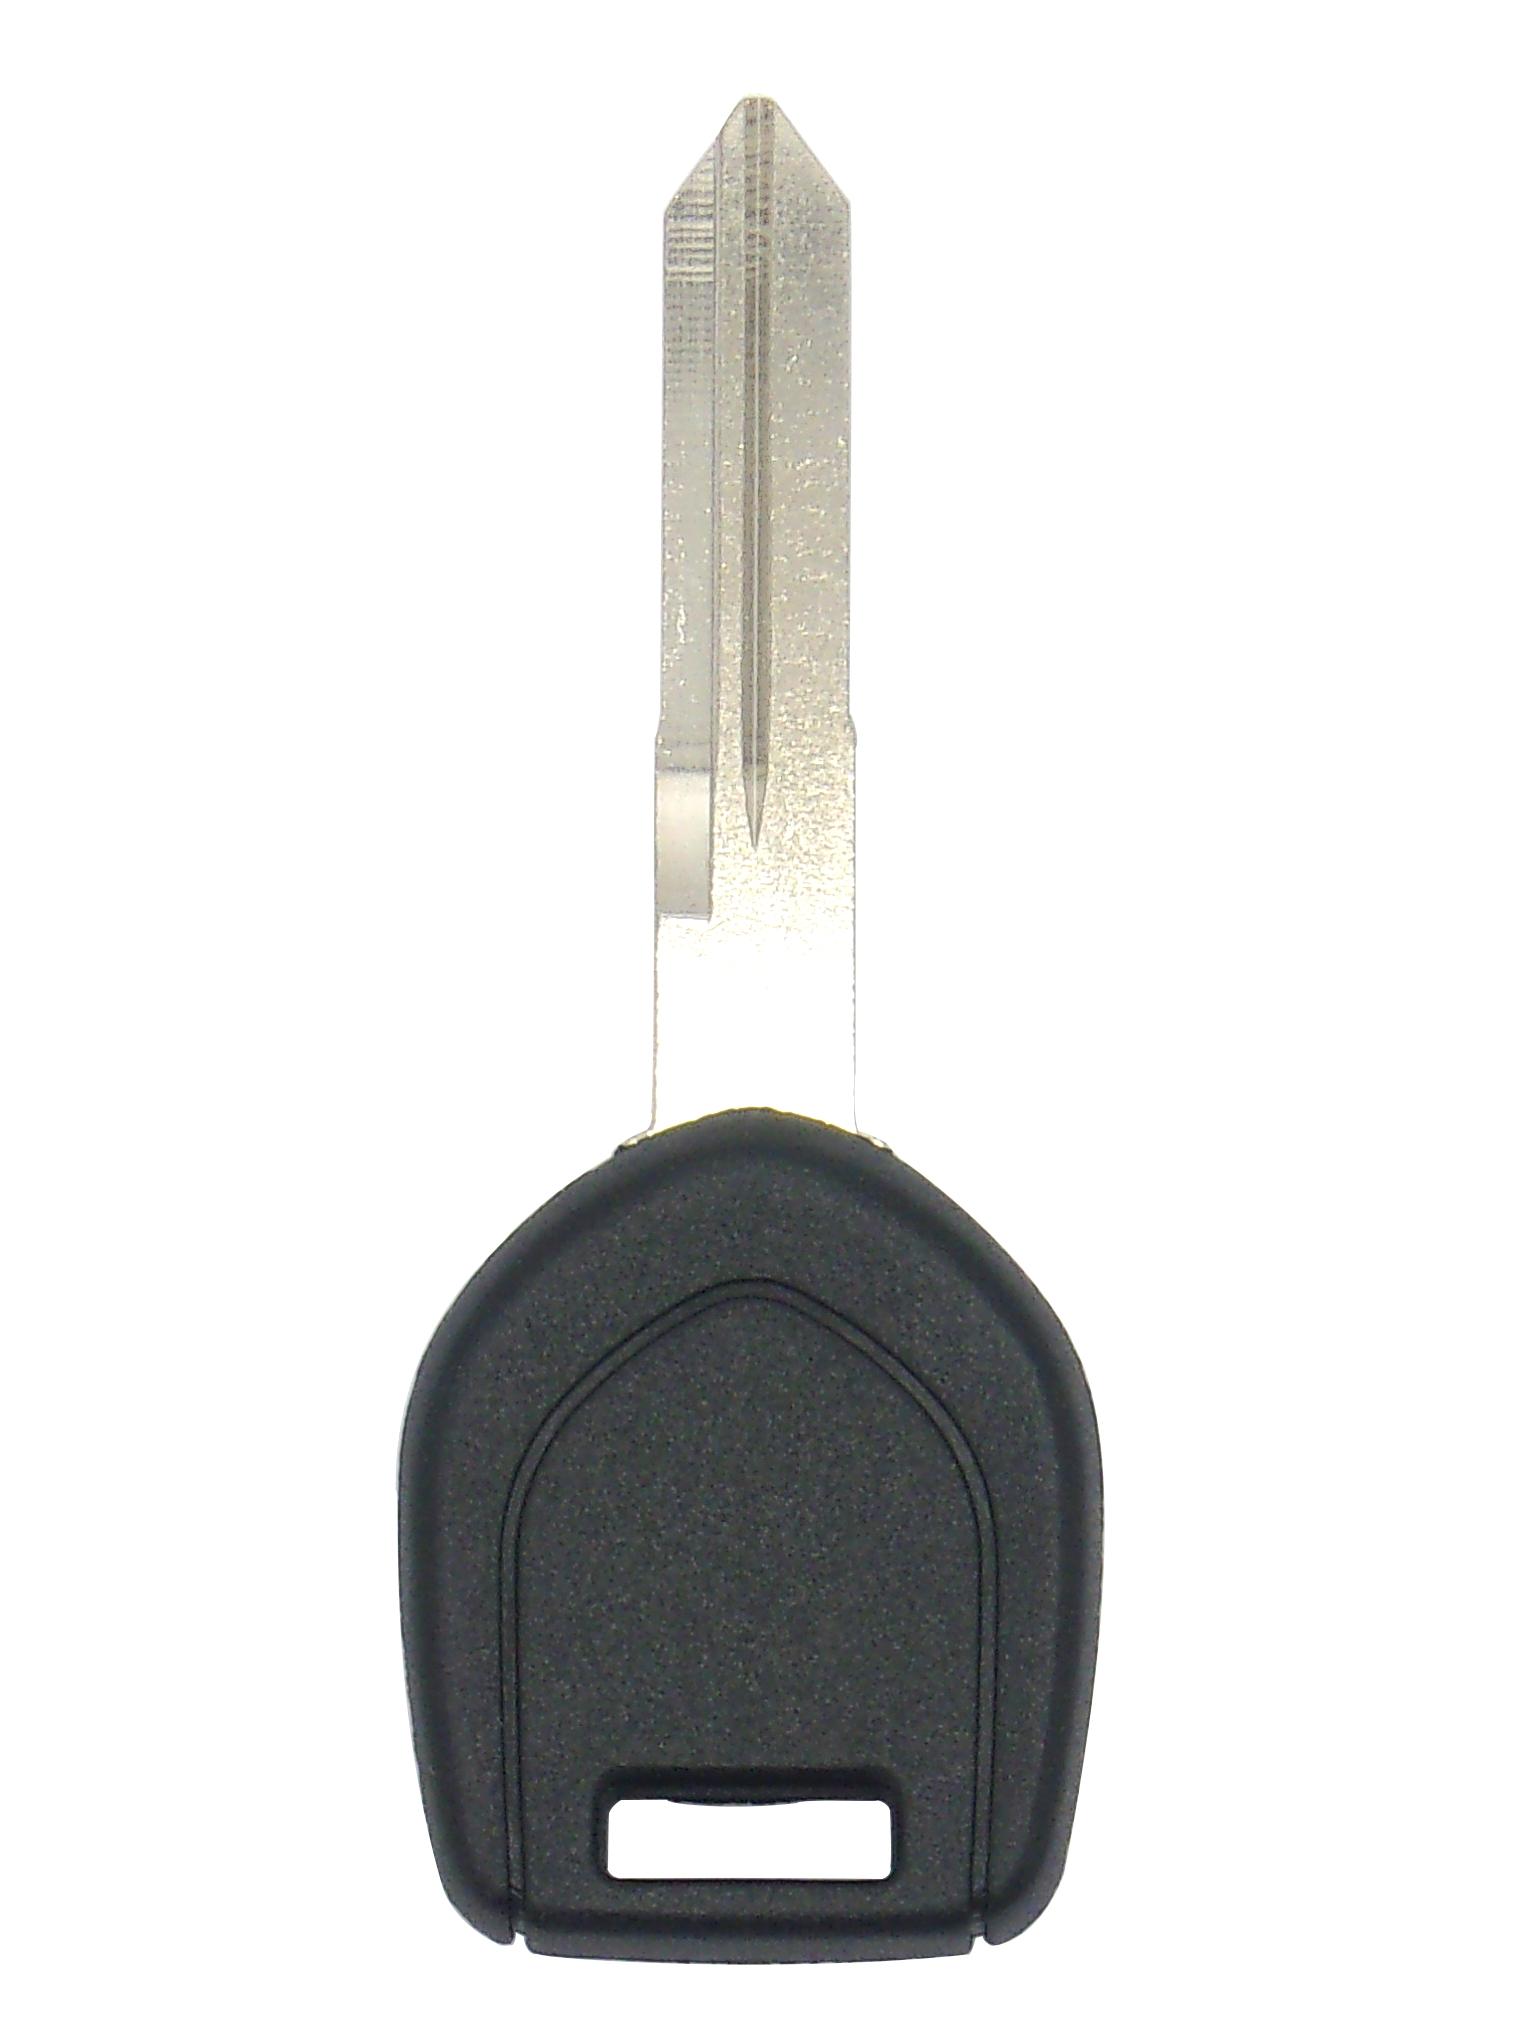 Mitsubishi Transponder Key